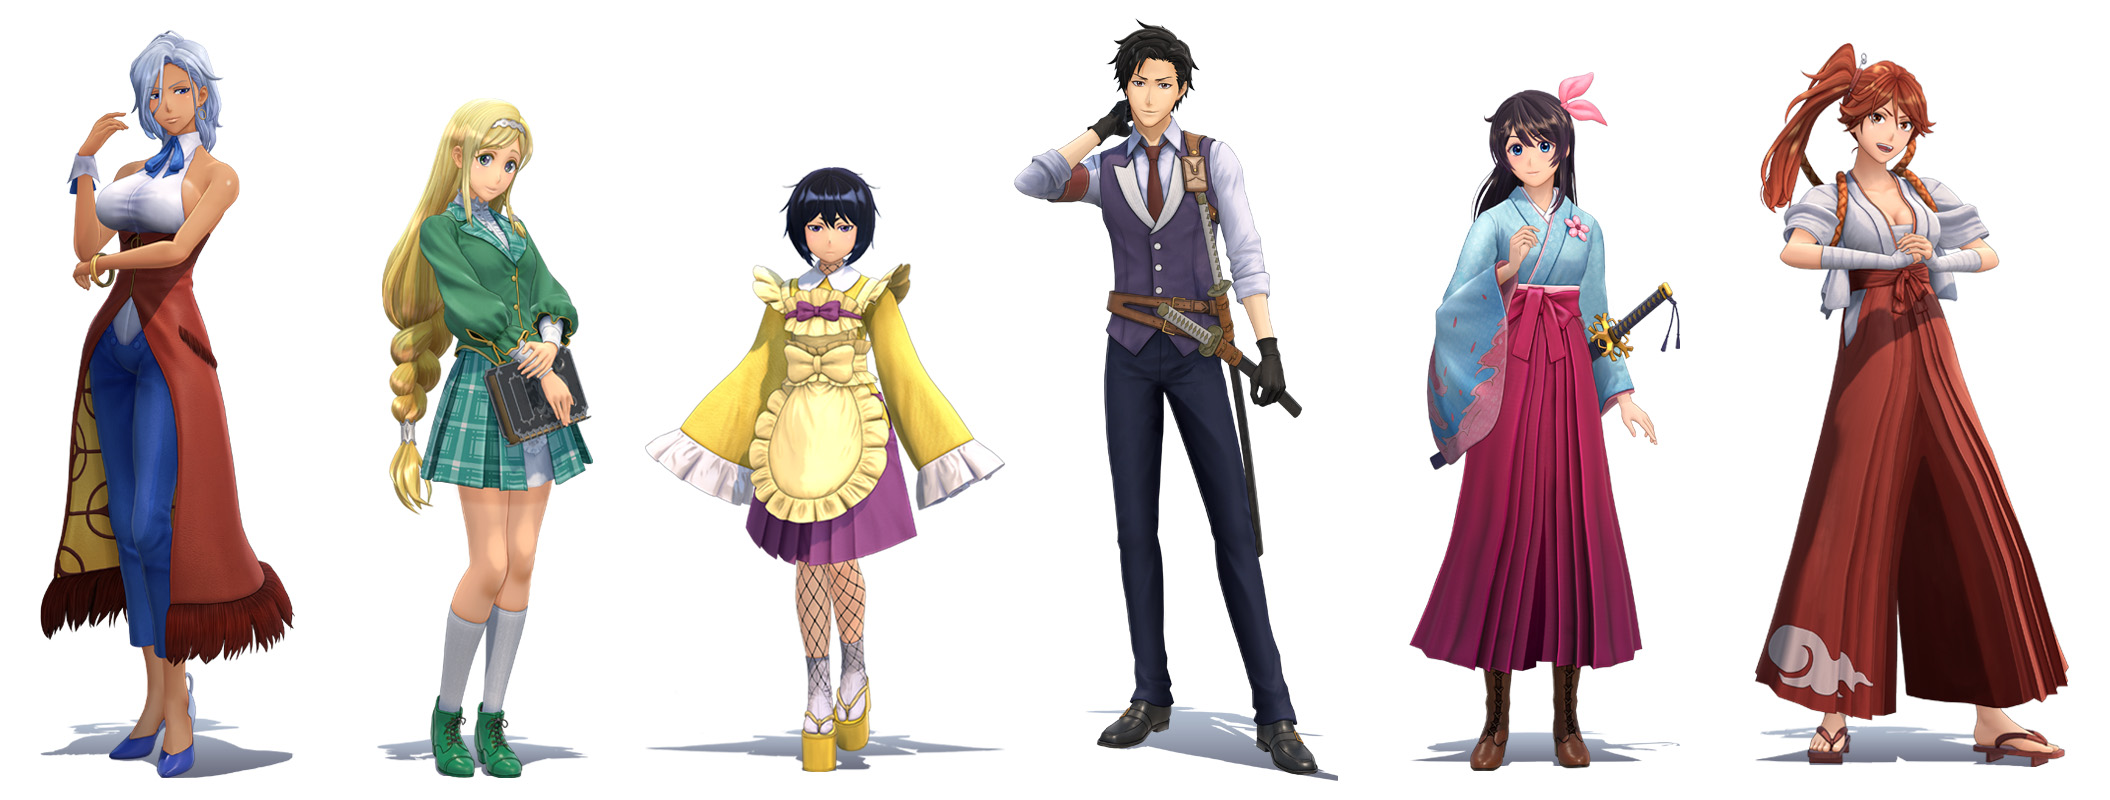 Project Sakura Wars Characters Renders